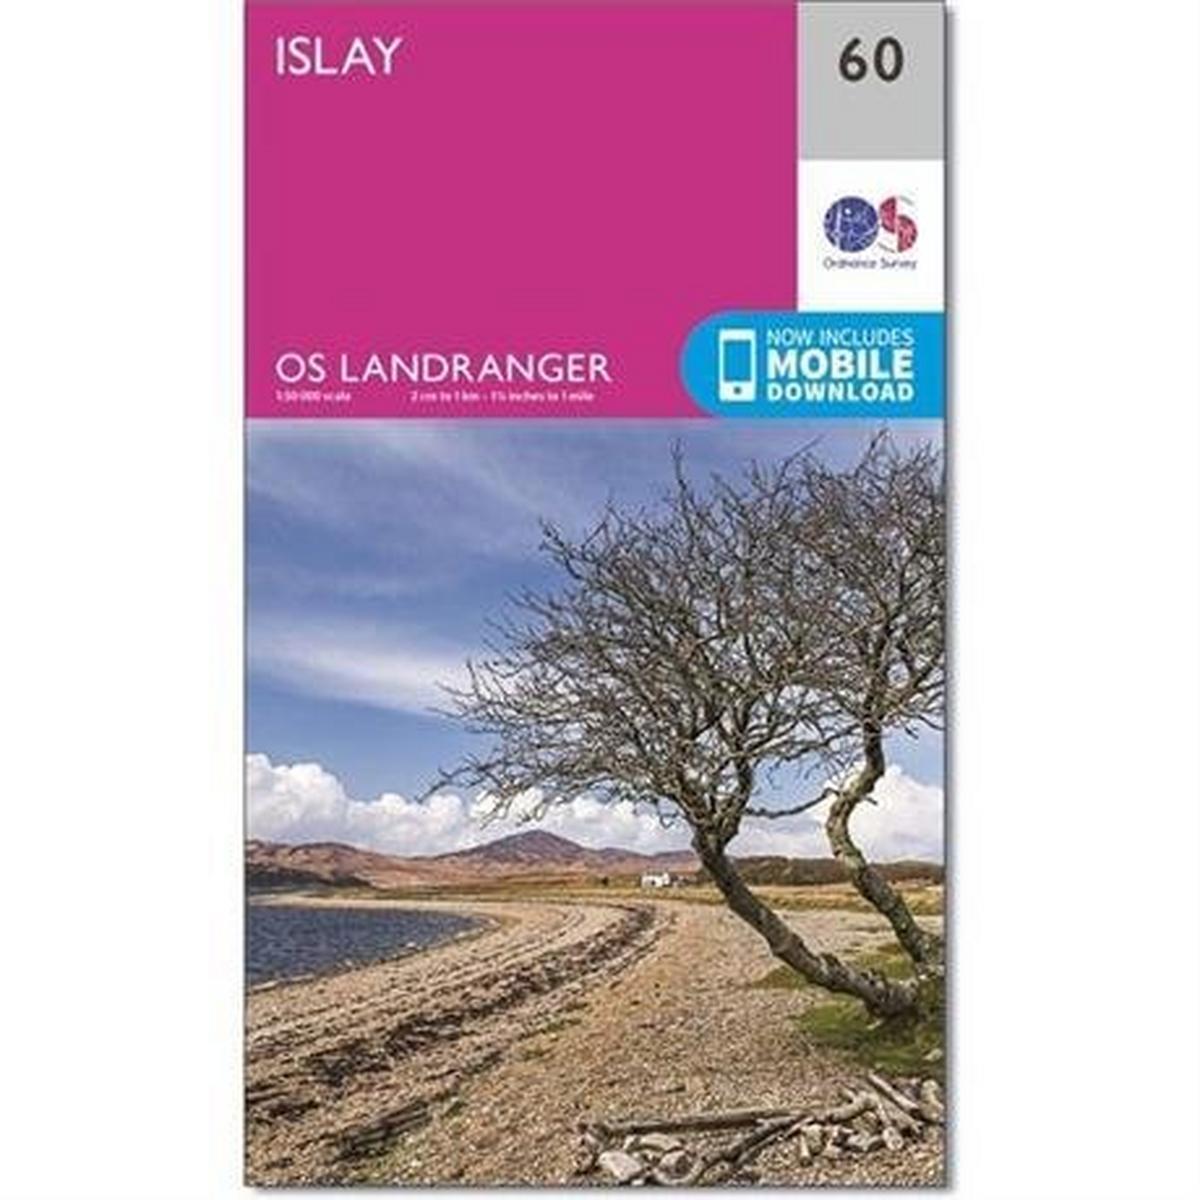 Ordnance Survey OS Landranger Map 60 Islay